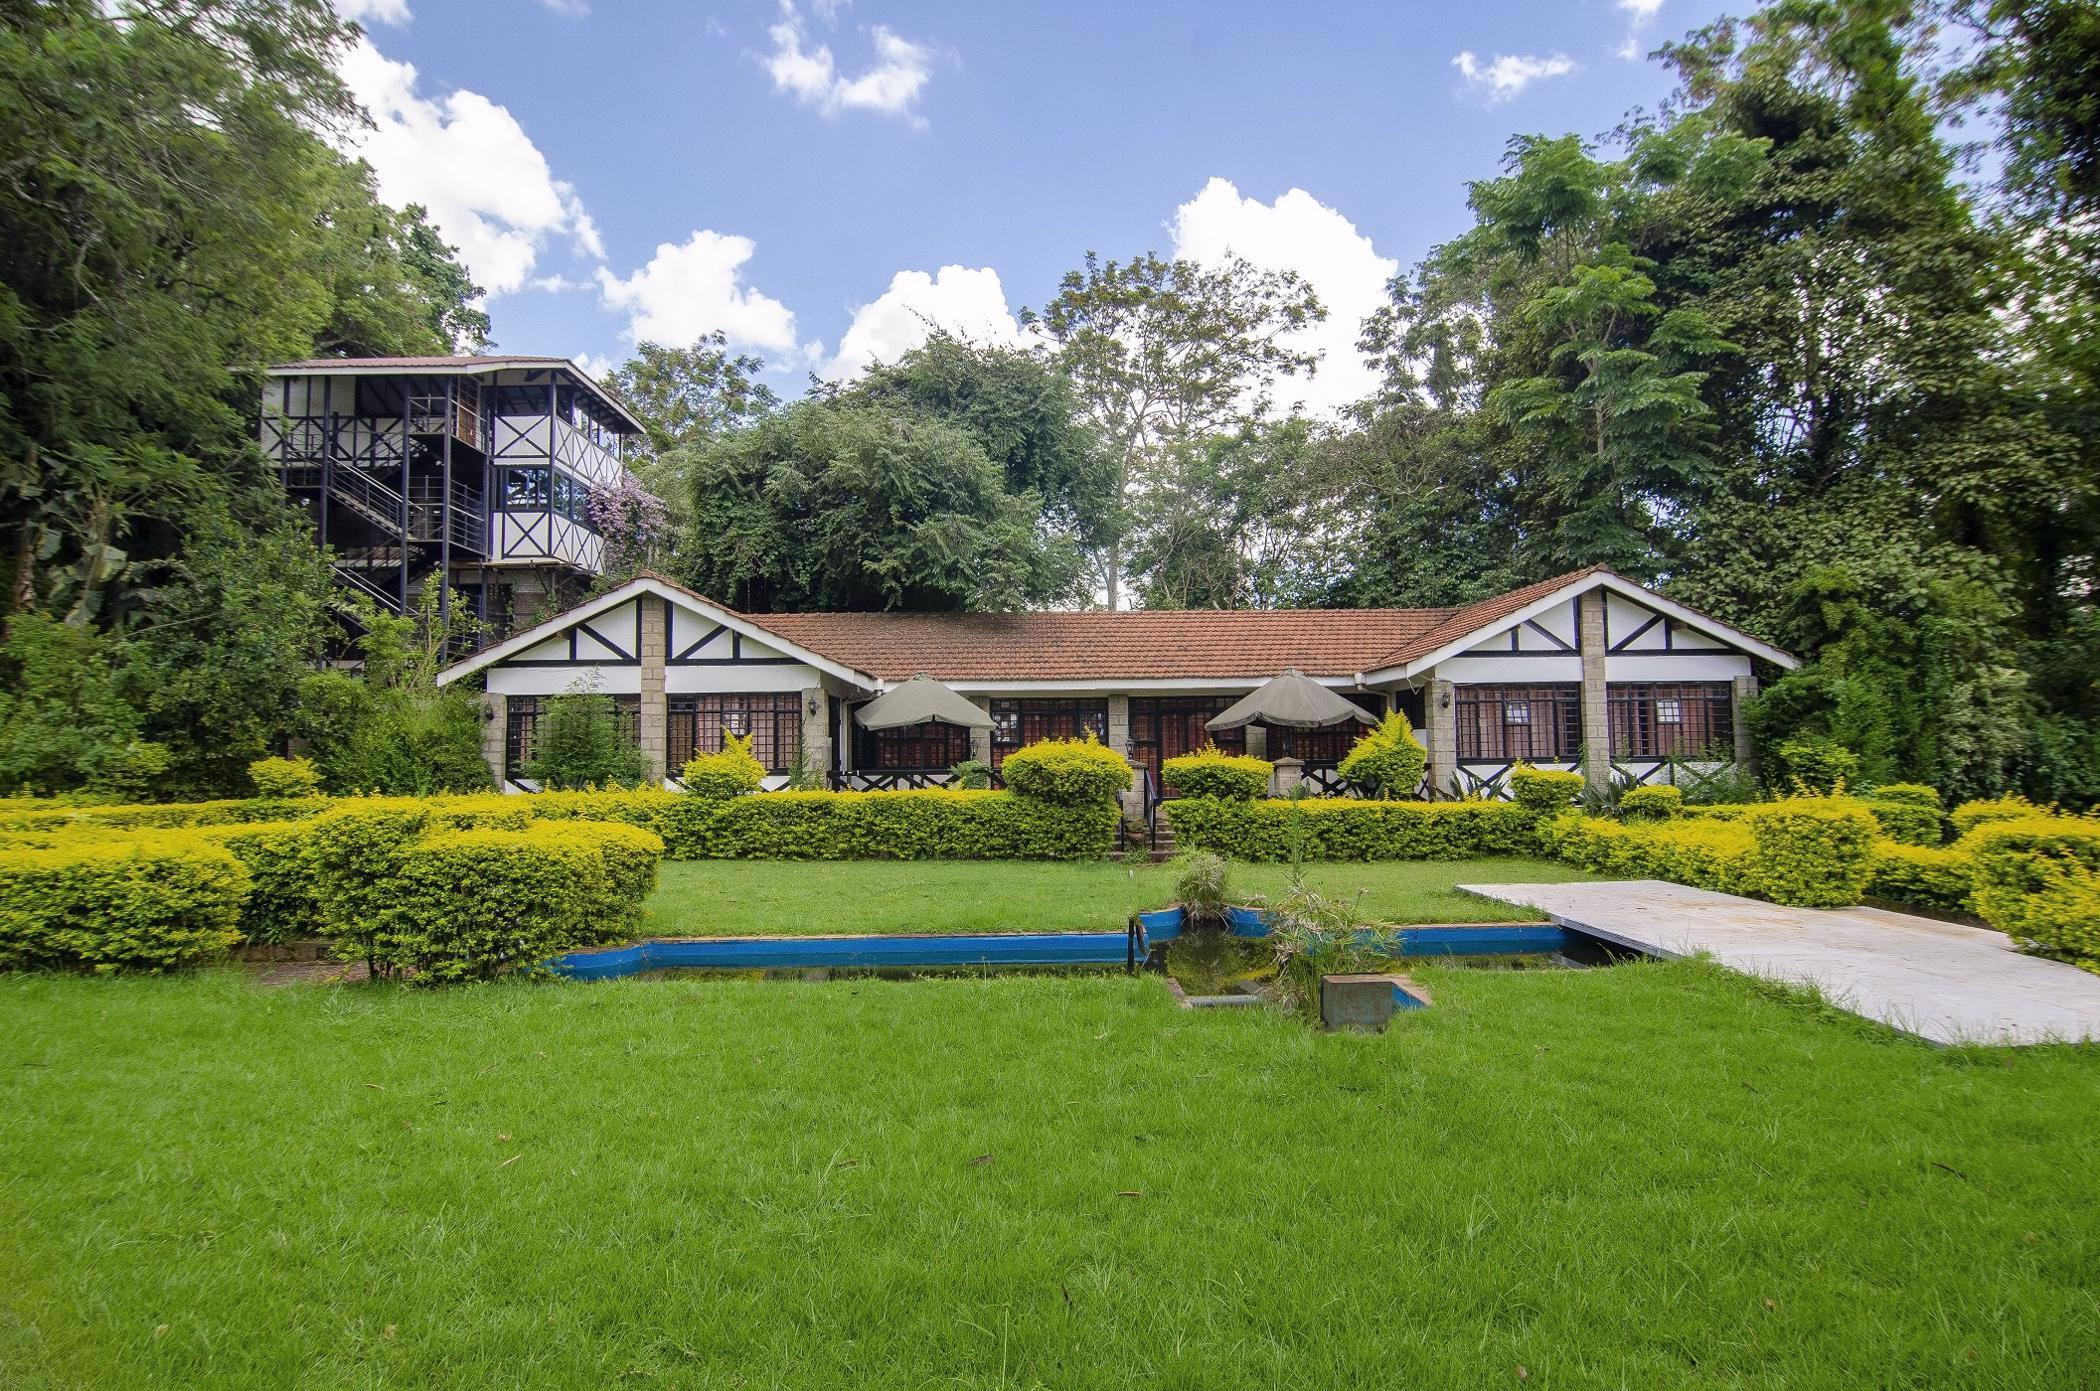 3 acres commercial vacant land for sale in Karen (Kenya)